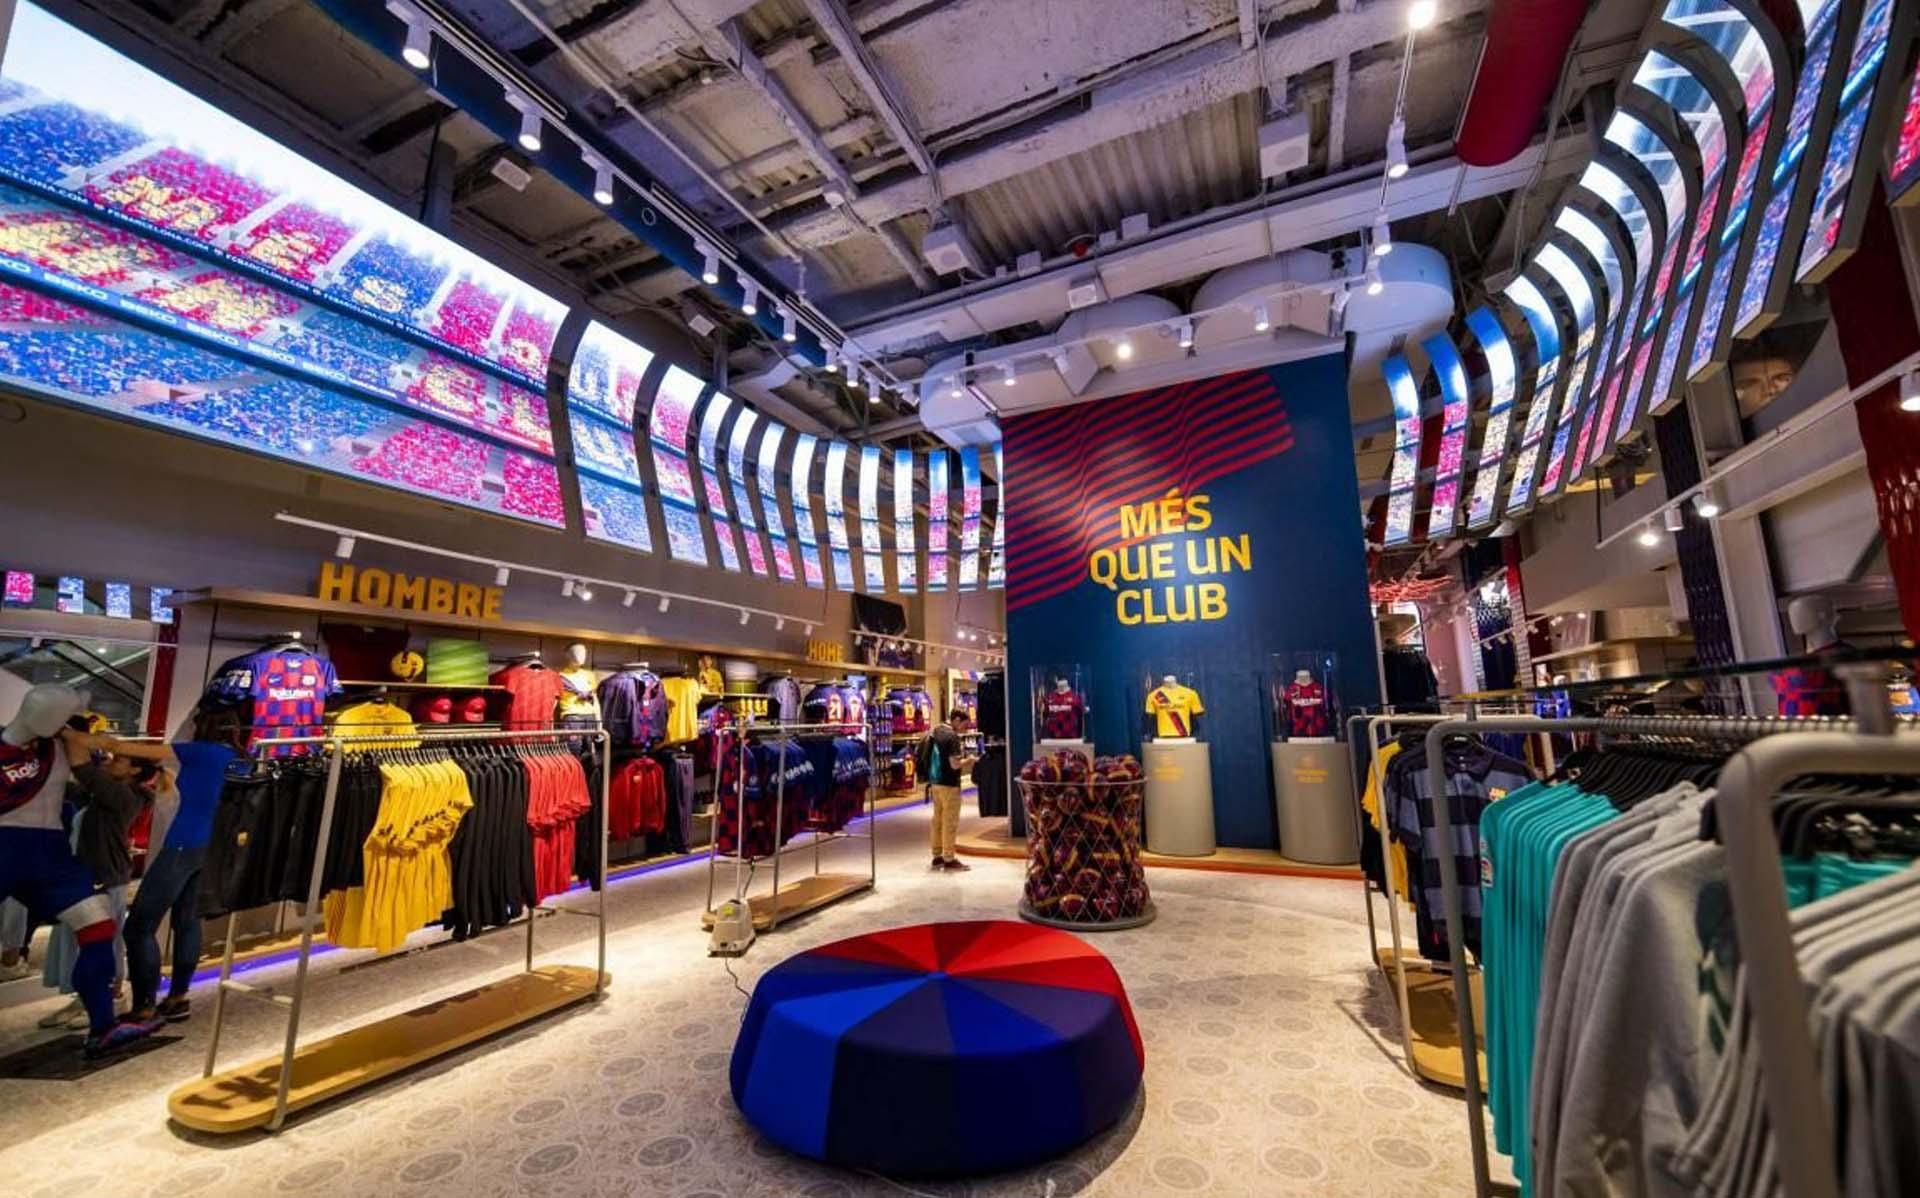 suma enfermedad Intolerable  Barcelona Open New Club Store On La Rambla - SoccerBible